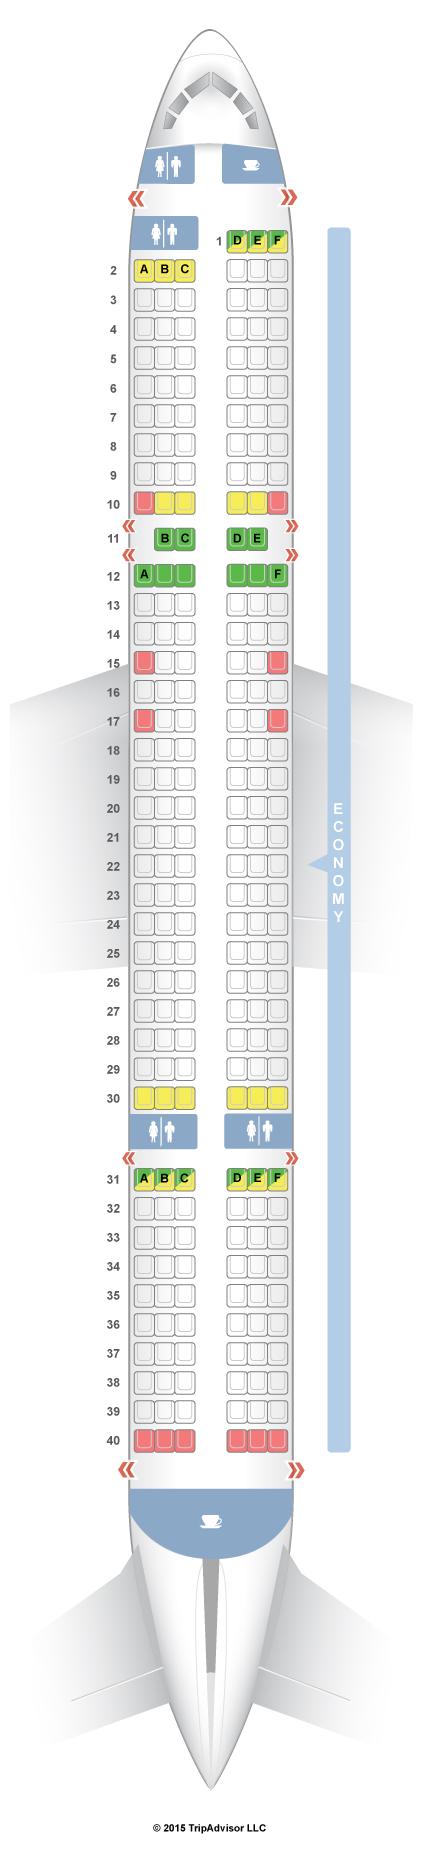 Seatguru Seat Map Thomas Cook Airlines Boeing 757 200 752